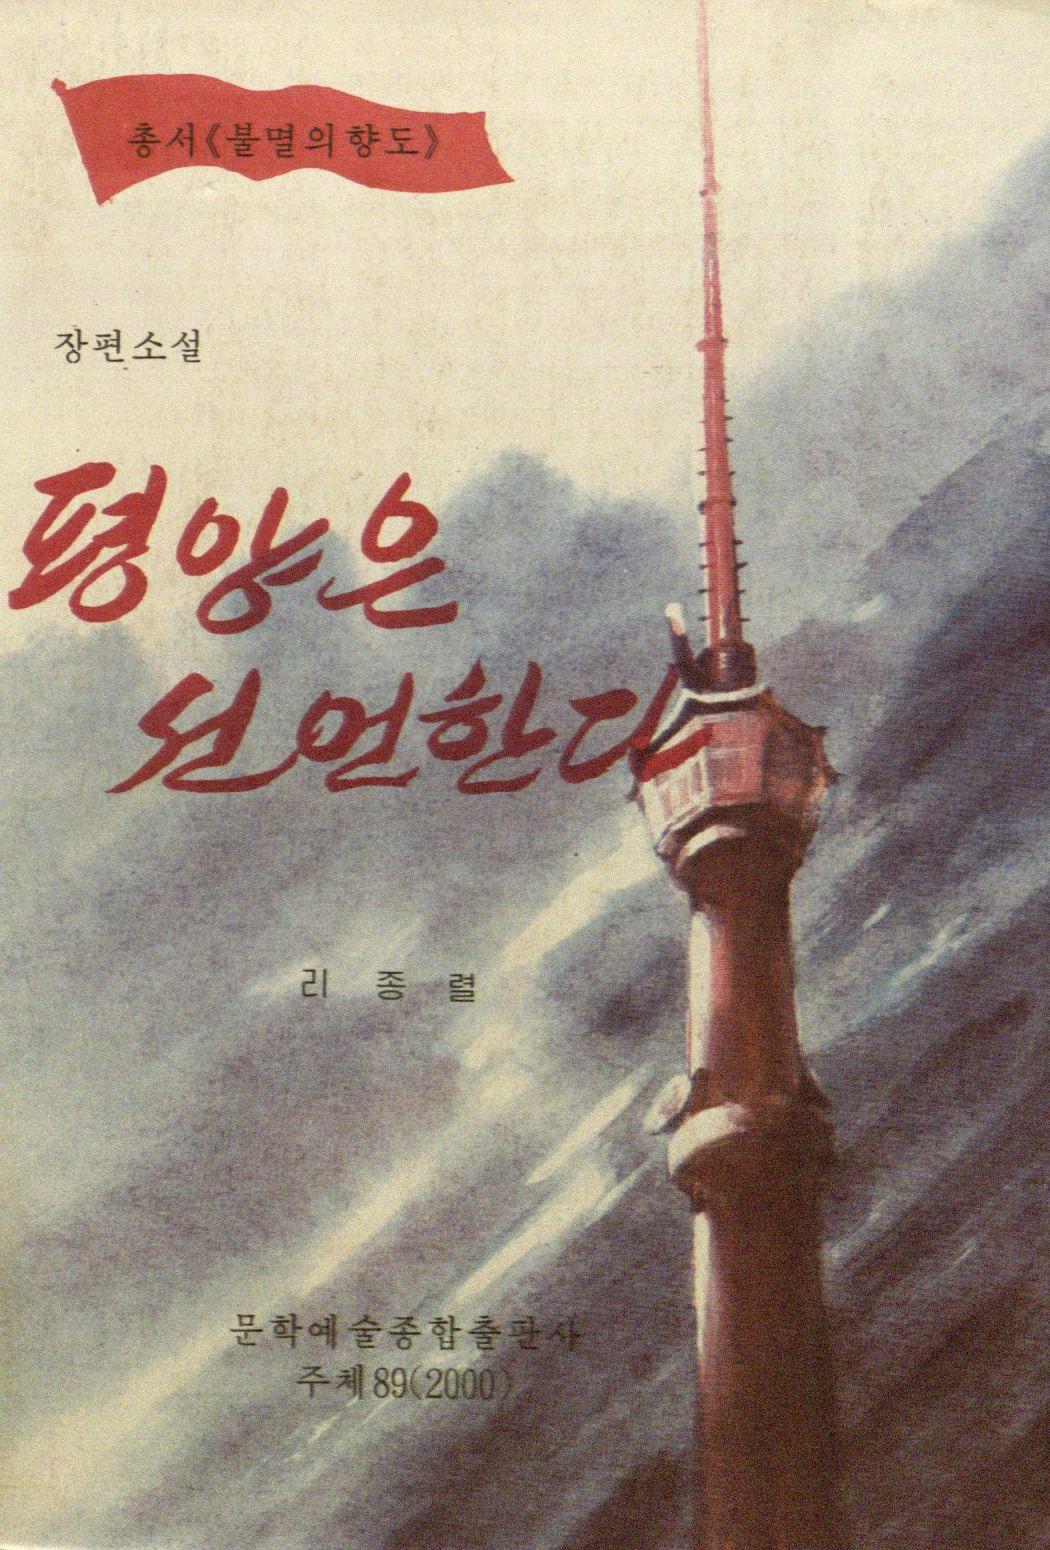 title page of 평양은 선언한다